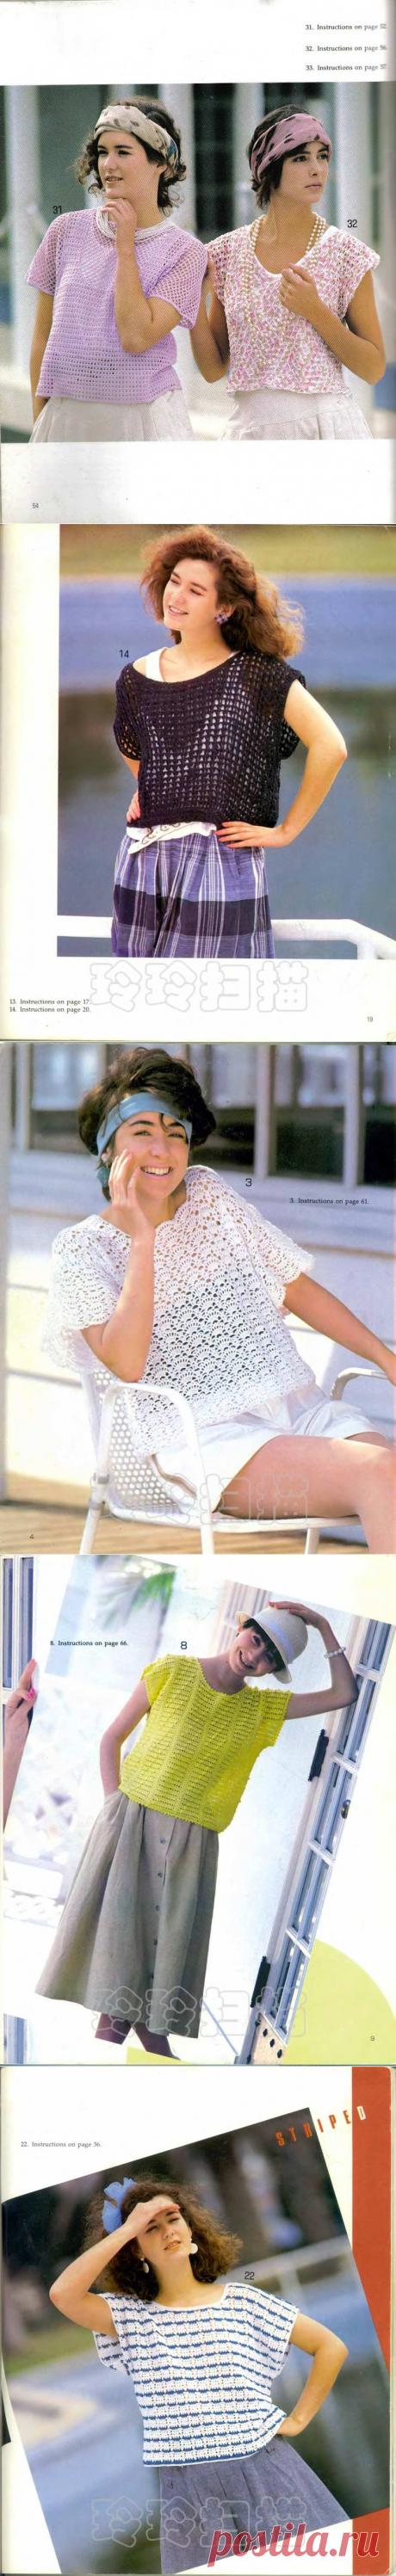 [Зарезервировано] Hook_Knitting_1986 - Замкнутый журнал - Netease блог